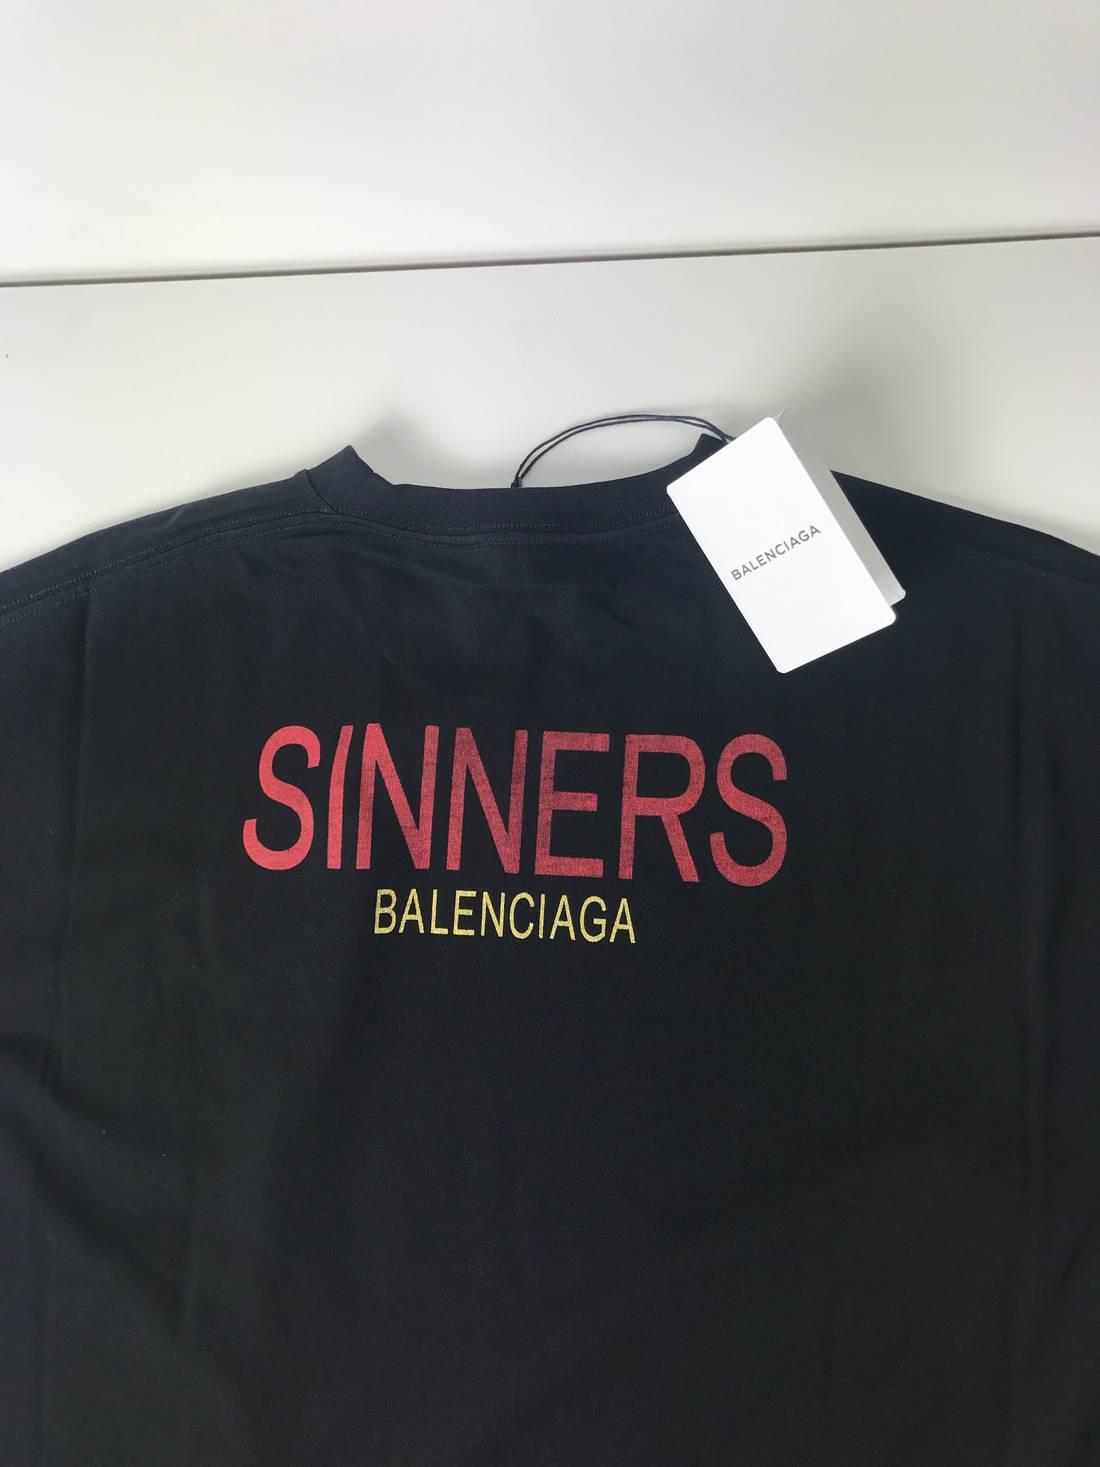 218a537f52ae5 Balenciaga T Shirt Mens Replica | RLDM